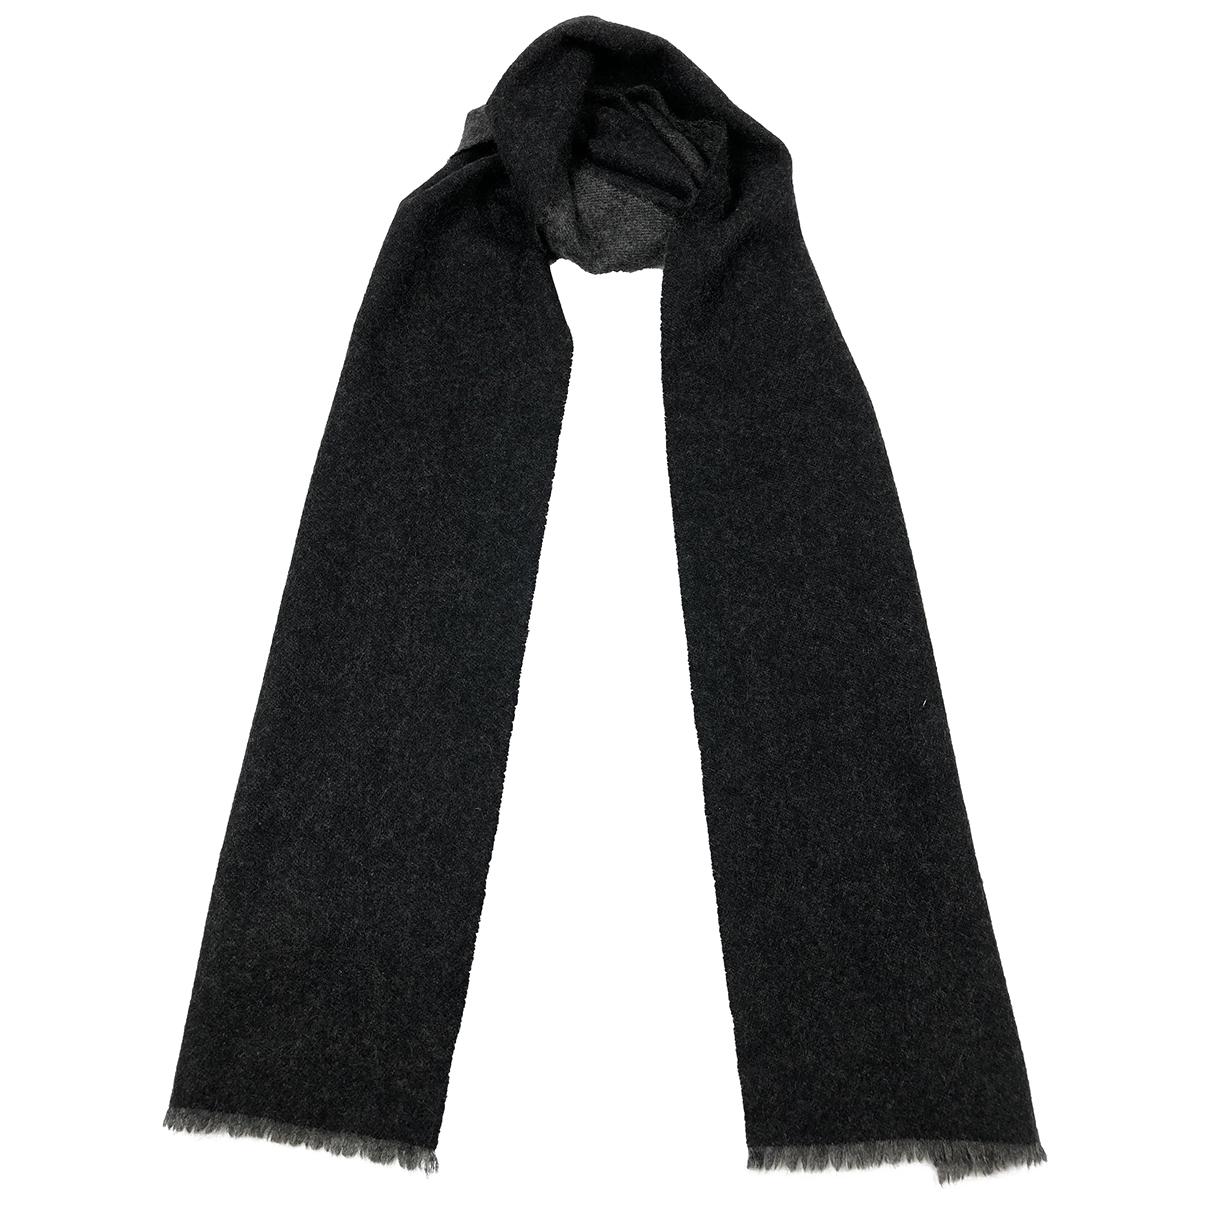 Calvin Klein - Cheches.Echarpes   pour homme en cachemire - anthracite